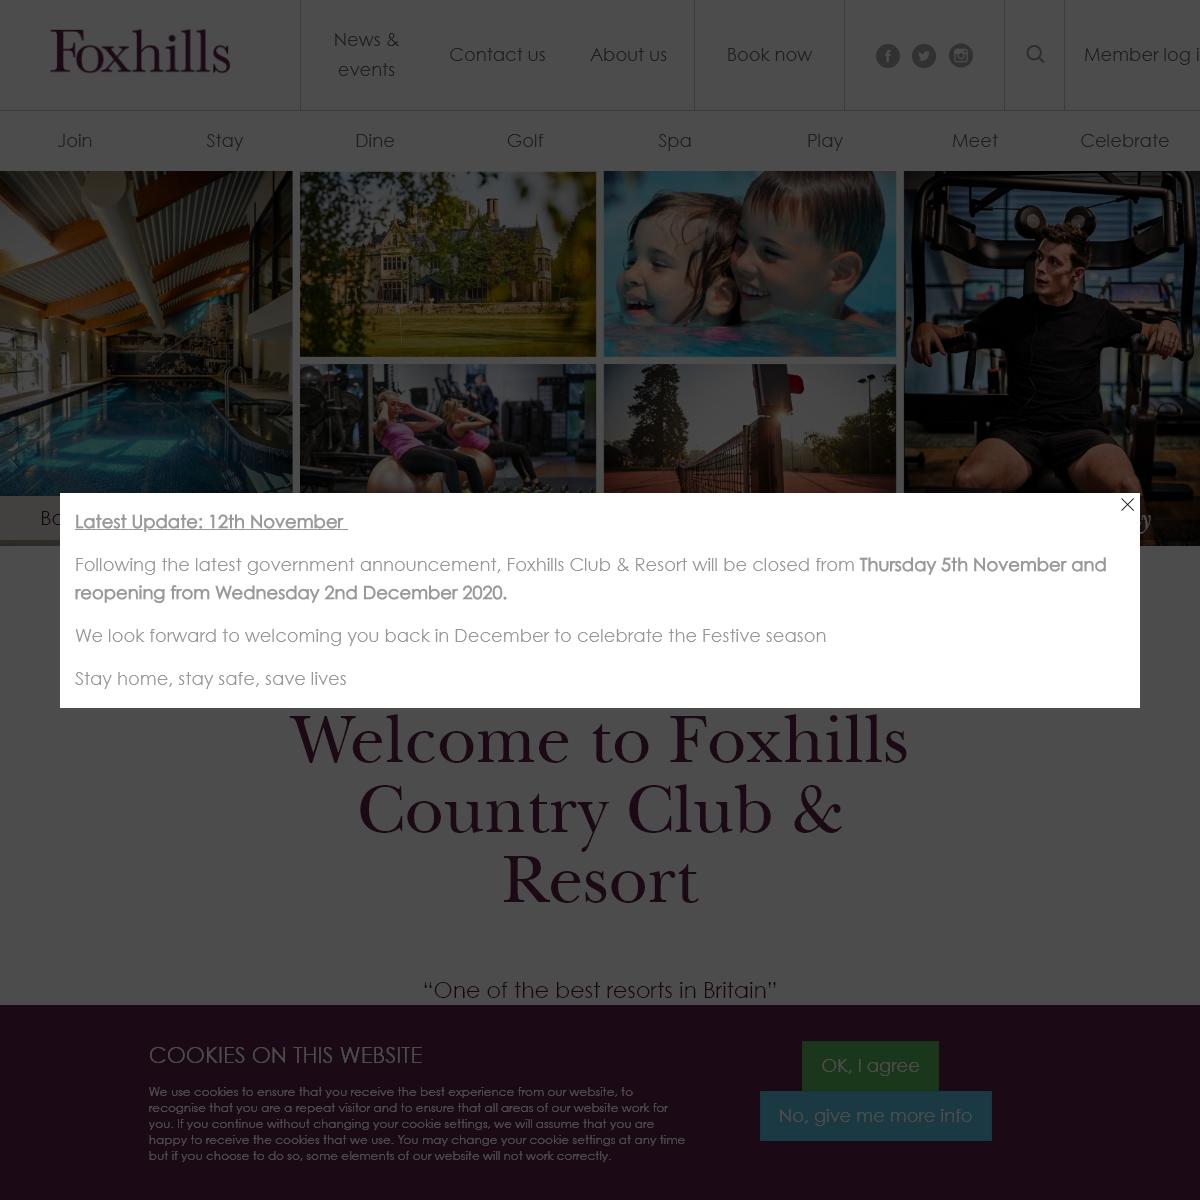 Foxhills Country Club & Resort - Award-winning Surrey Spa & Golf